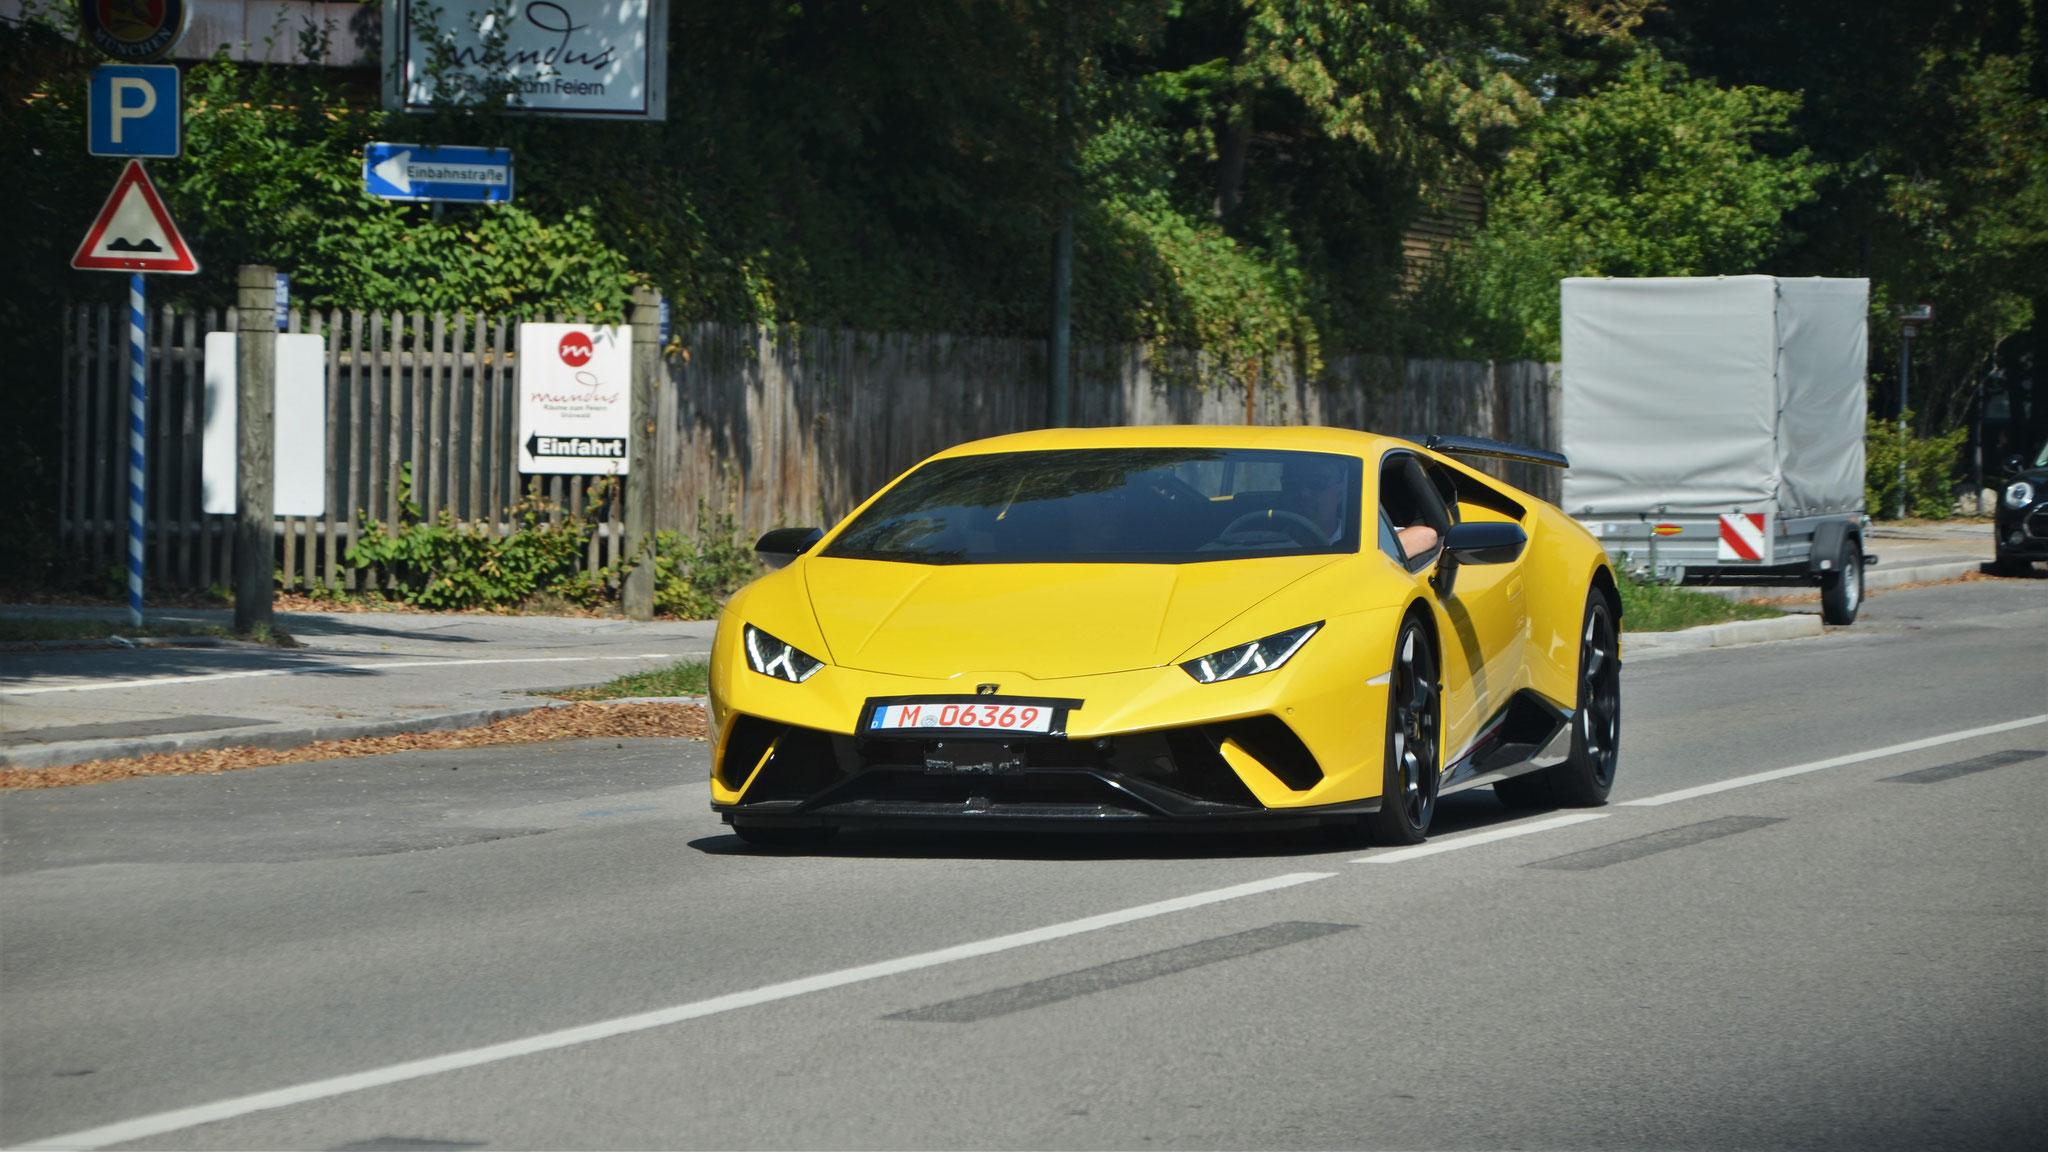 Lamborghini Huracan Performante - M-06369